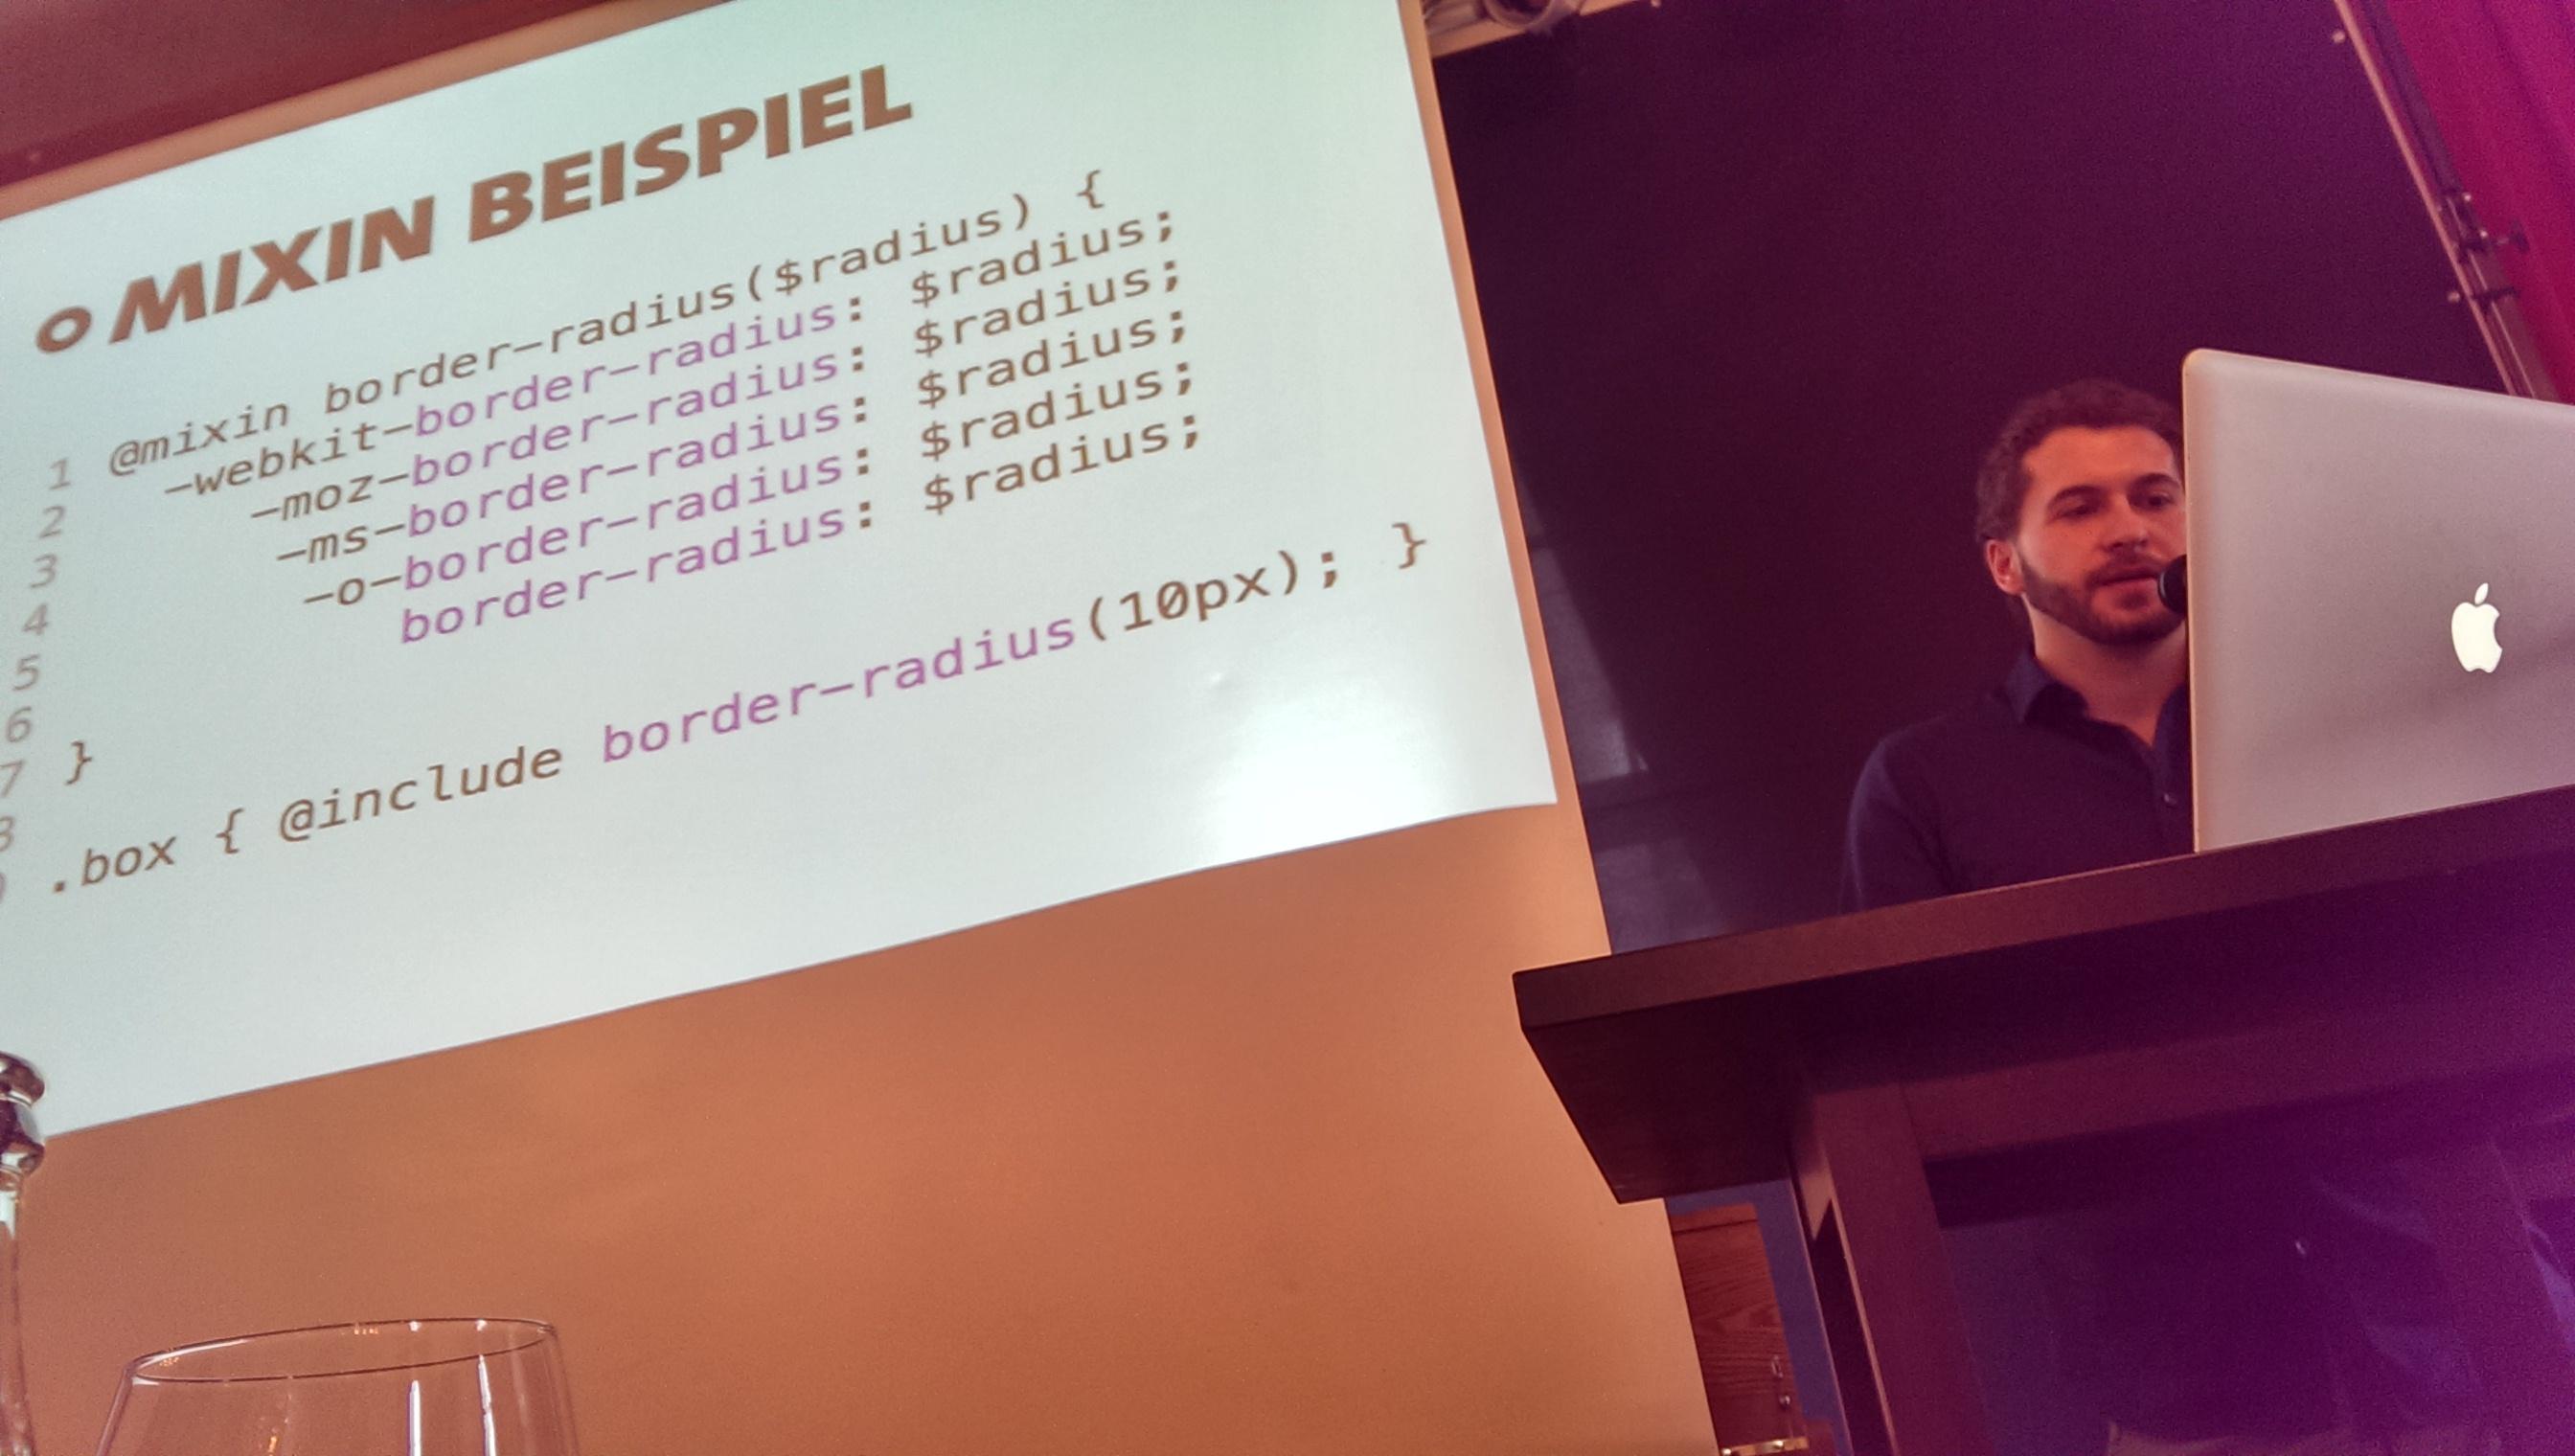 Effiziente CSS-Erstellung via Mixins gemäss Felipe Kaufmann